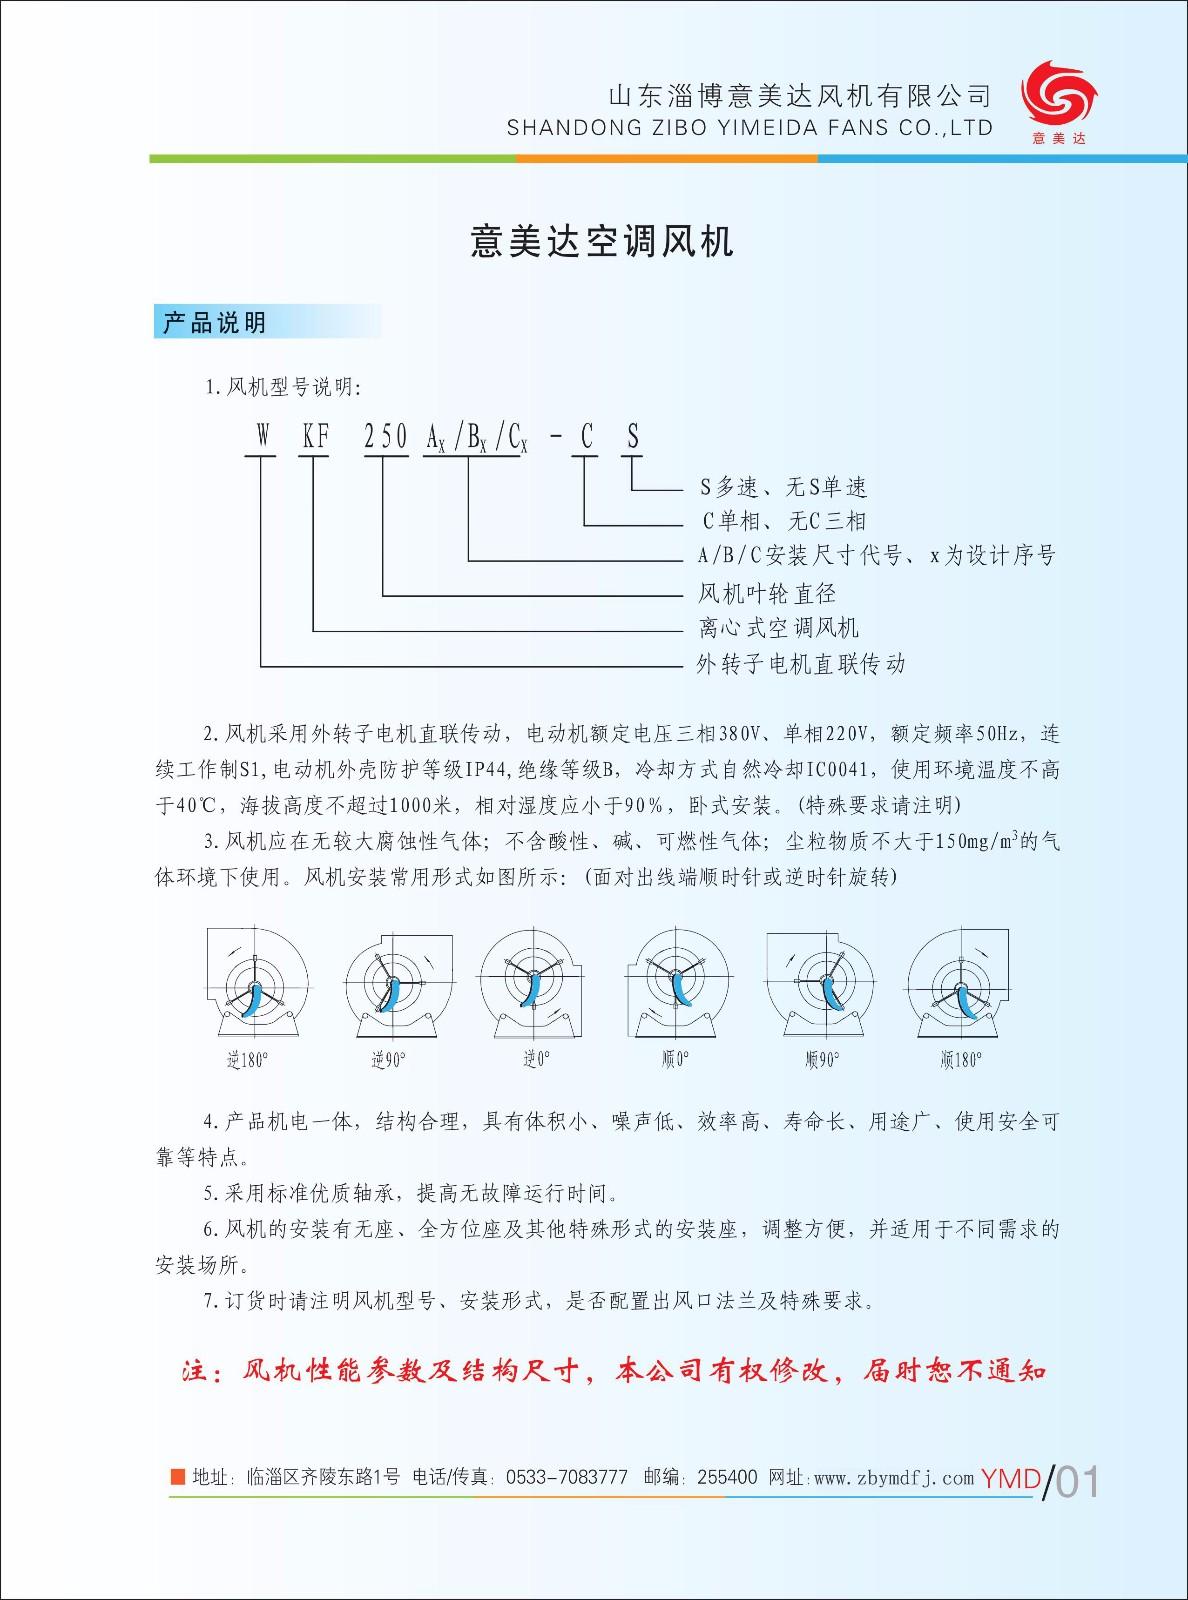 WKF200A2|WKF200A-山东淄博意美达风机有限公司